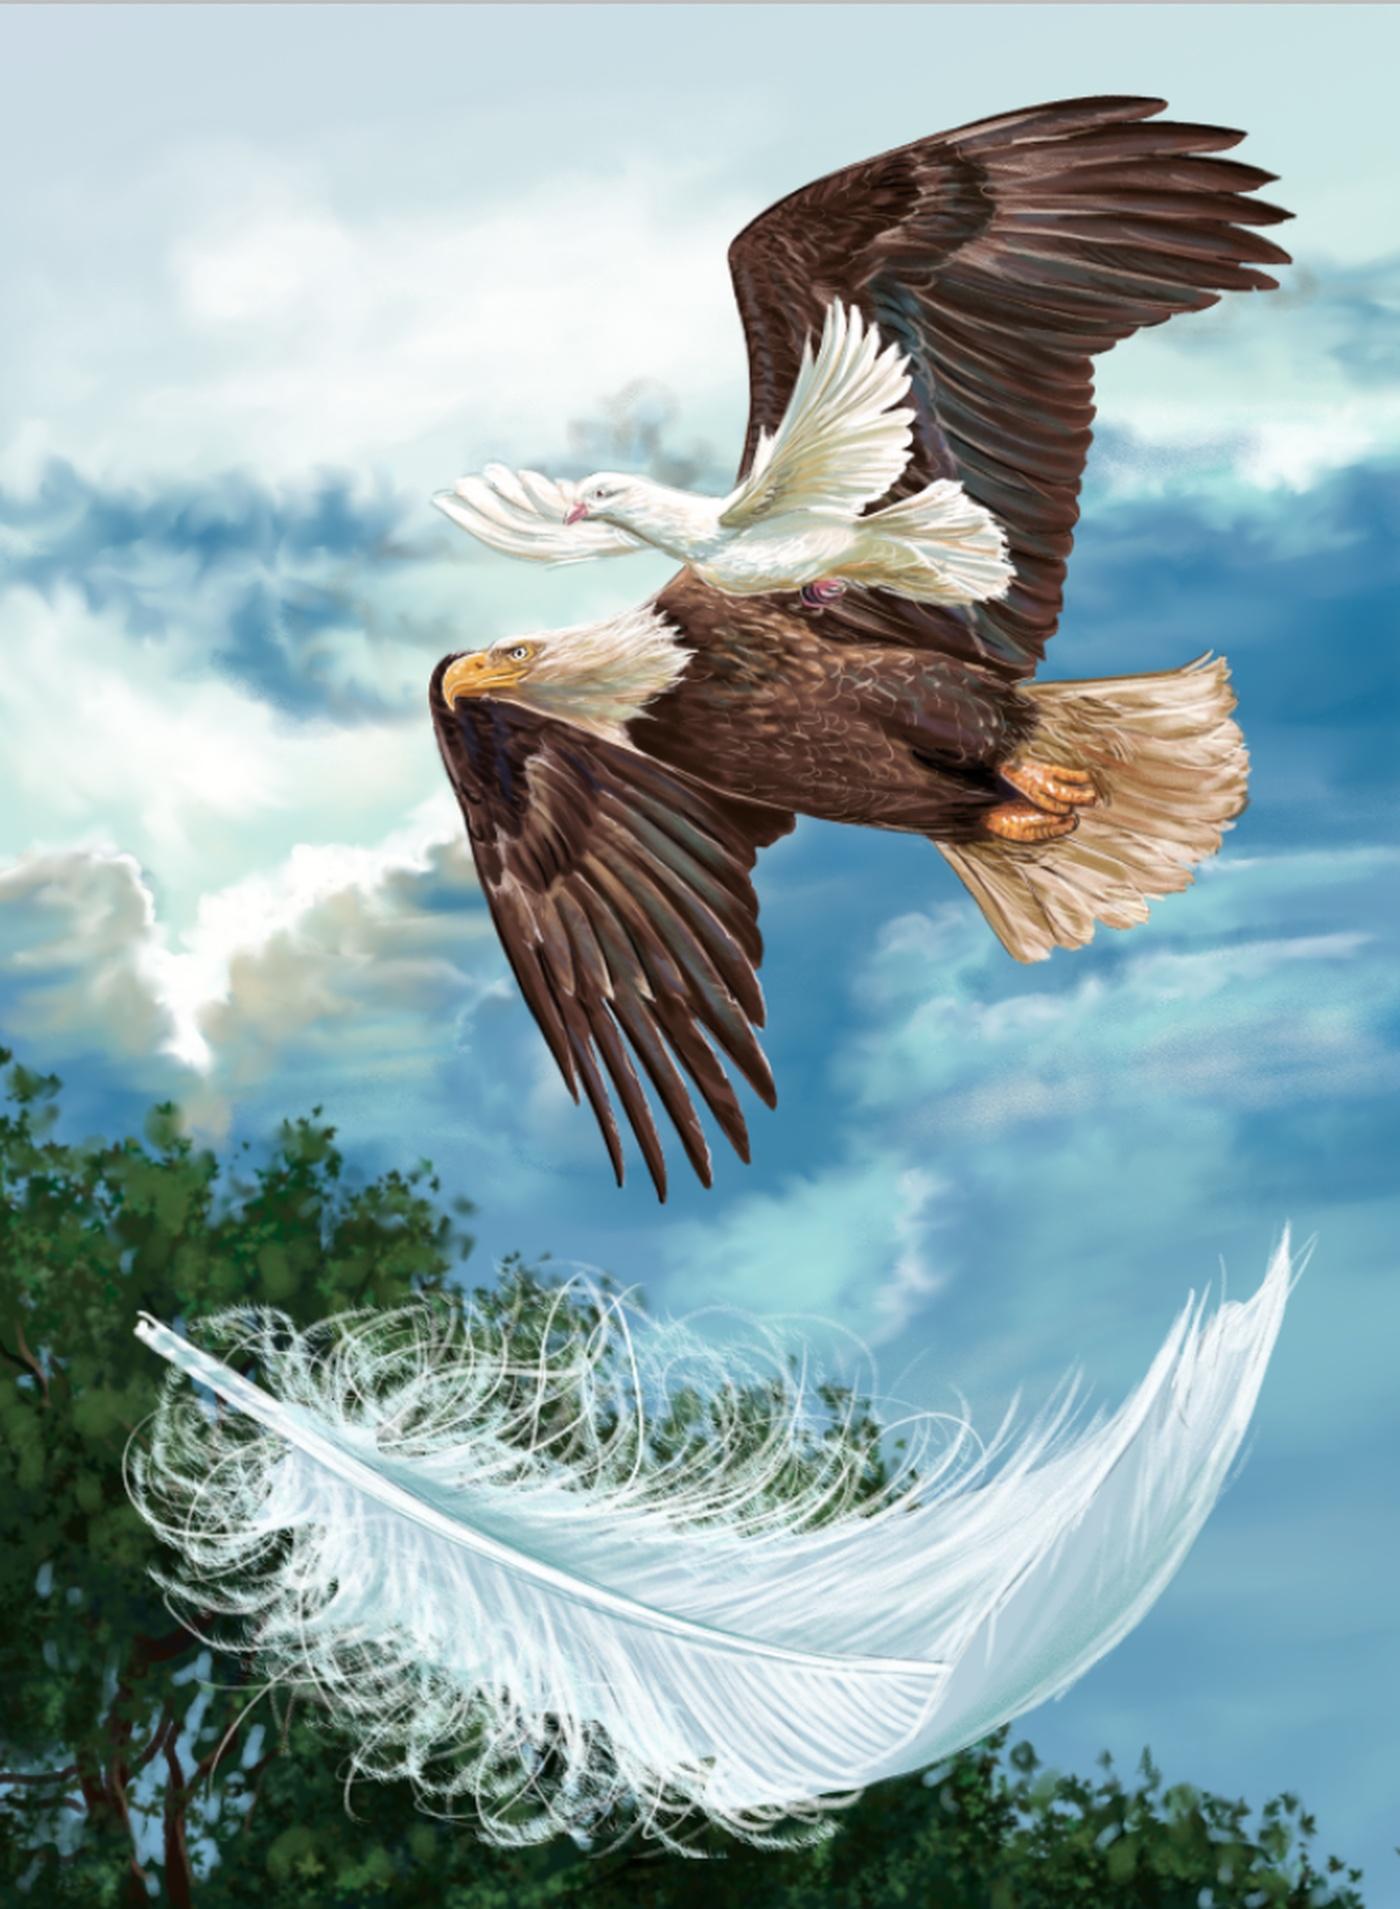 L'aigle Bouchard Québec Illustration La Et Jocelyne Colombe 1tB6xzqw